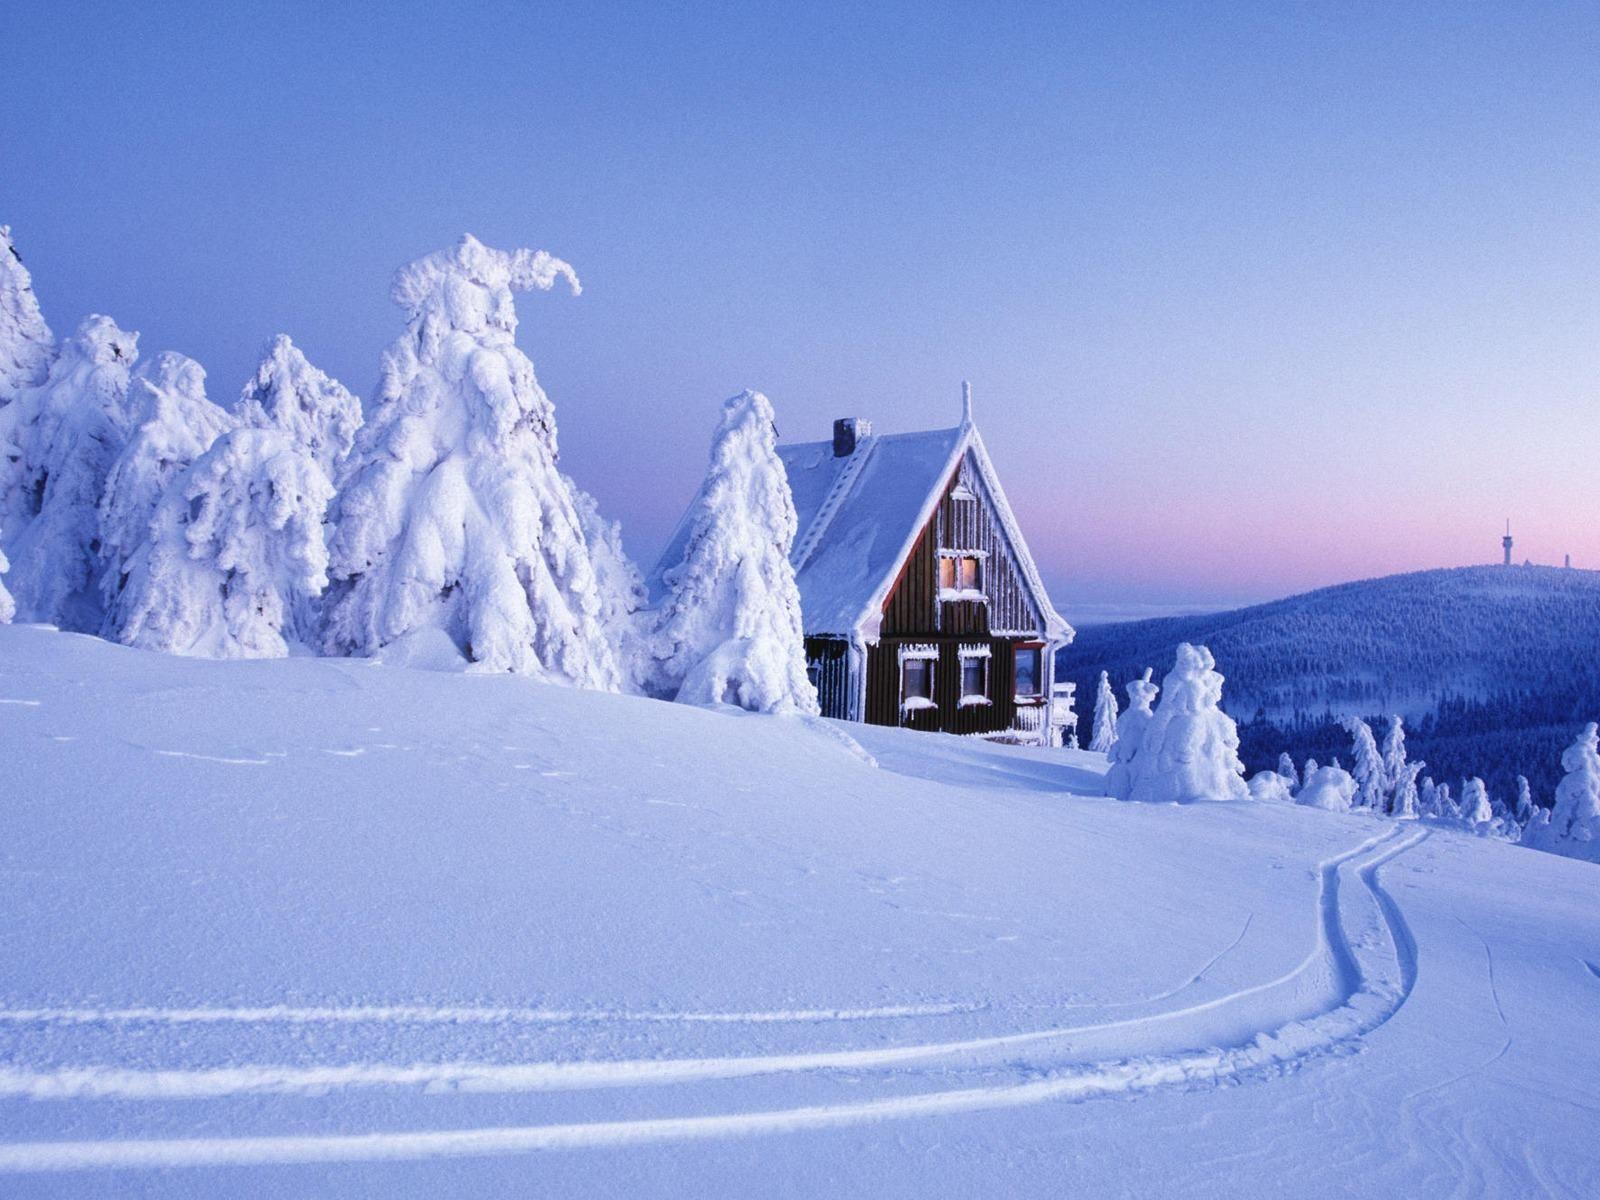 Beautiful Wallpaper Mountain Christmas - 8dde41996b2423674eabce25a95c57d1  Pic_202955.jpg